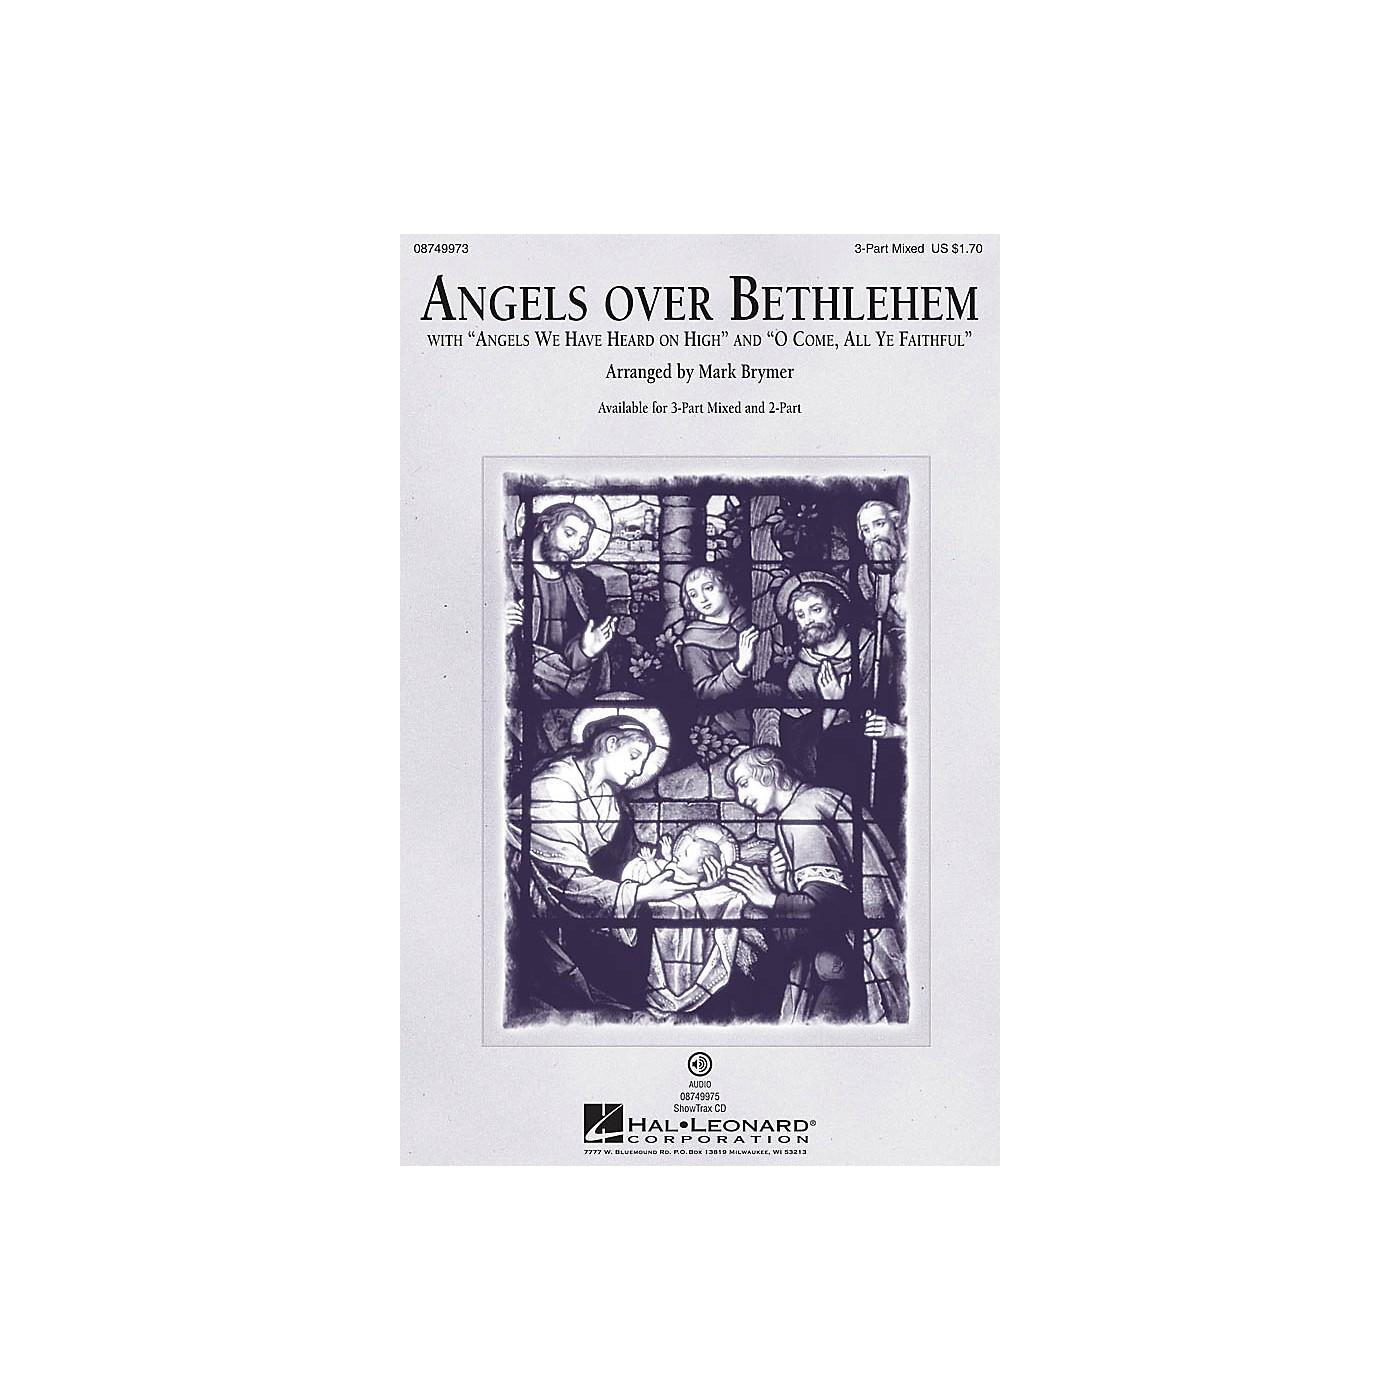 Hal Leonard Angels Over Bethlehem 3-Part Mixed arranged by Mark Brymer thumbnail